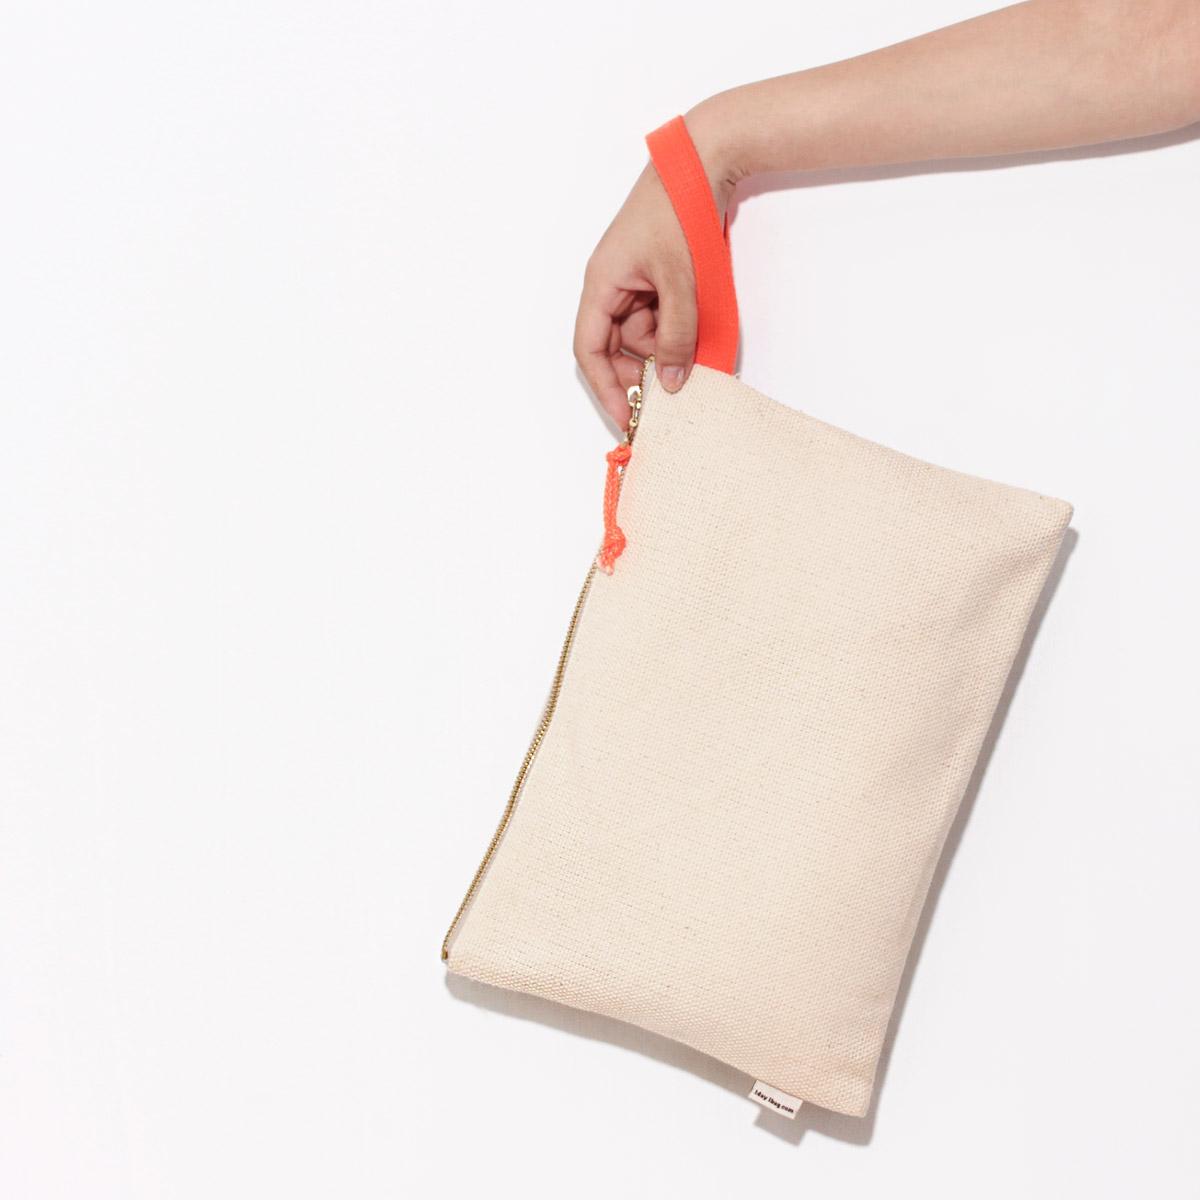 [A4手拿包-螢光橘色腕帶] 手拿包/上課包/拉鍊袋/帆布包/Eco包/1day1bag